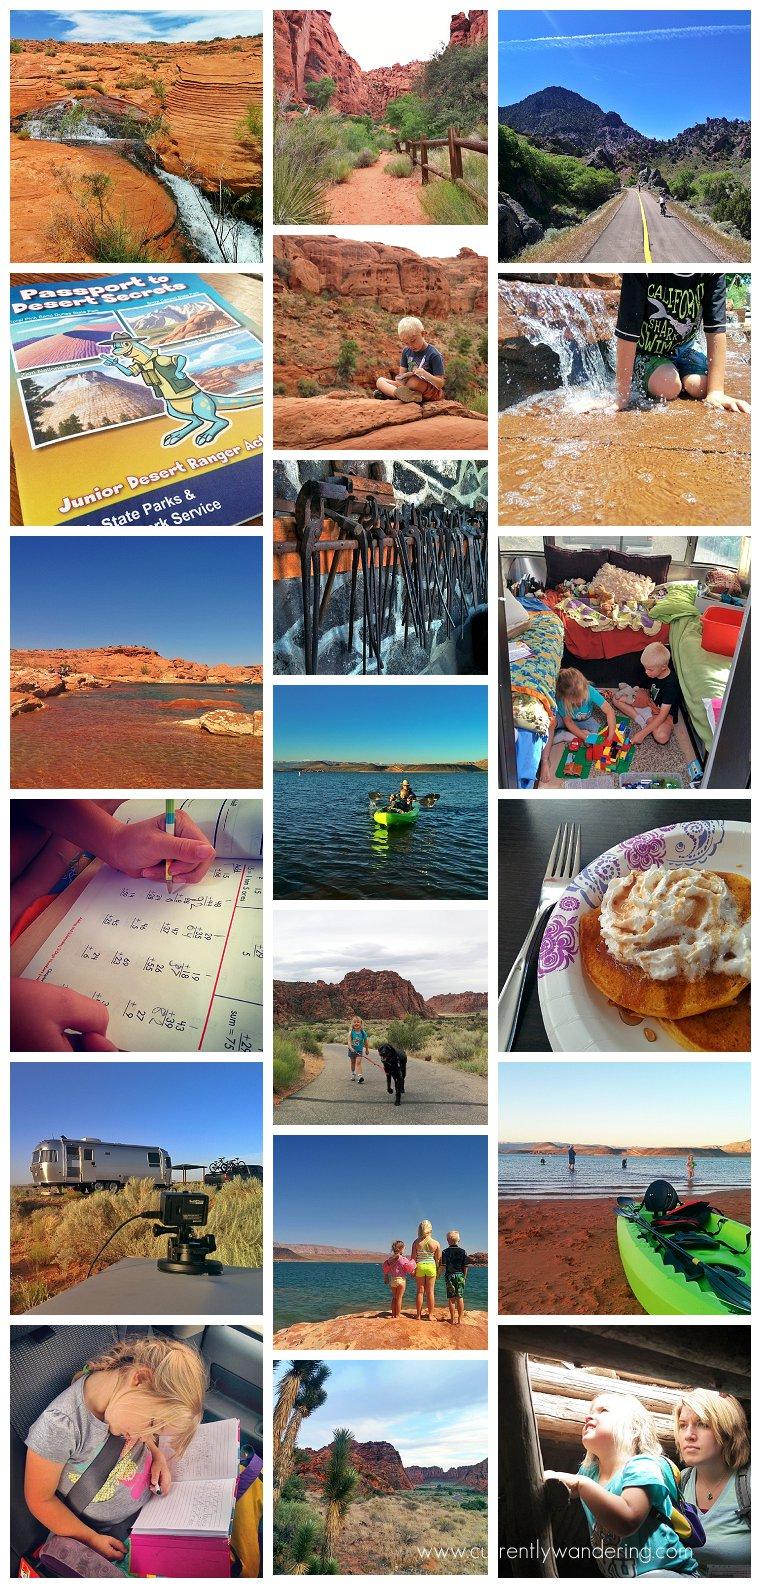 This Week on Instagram May 17-23 2014